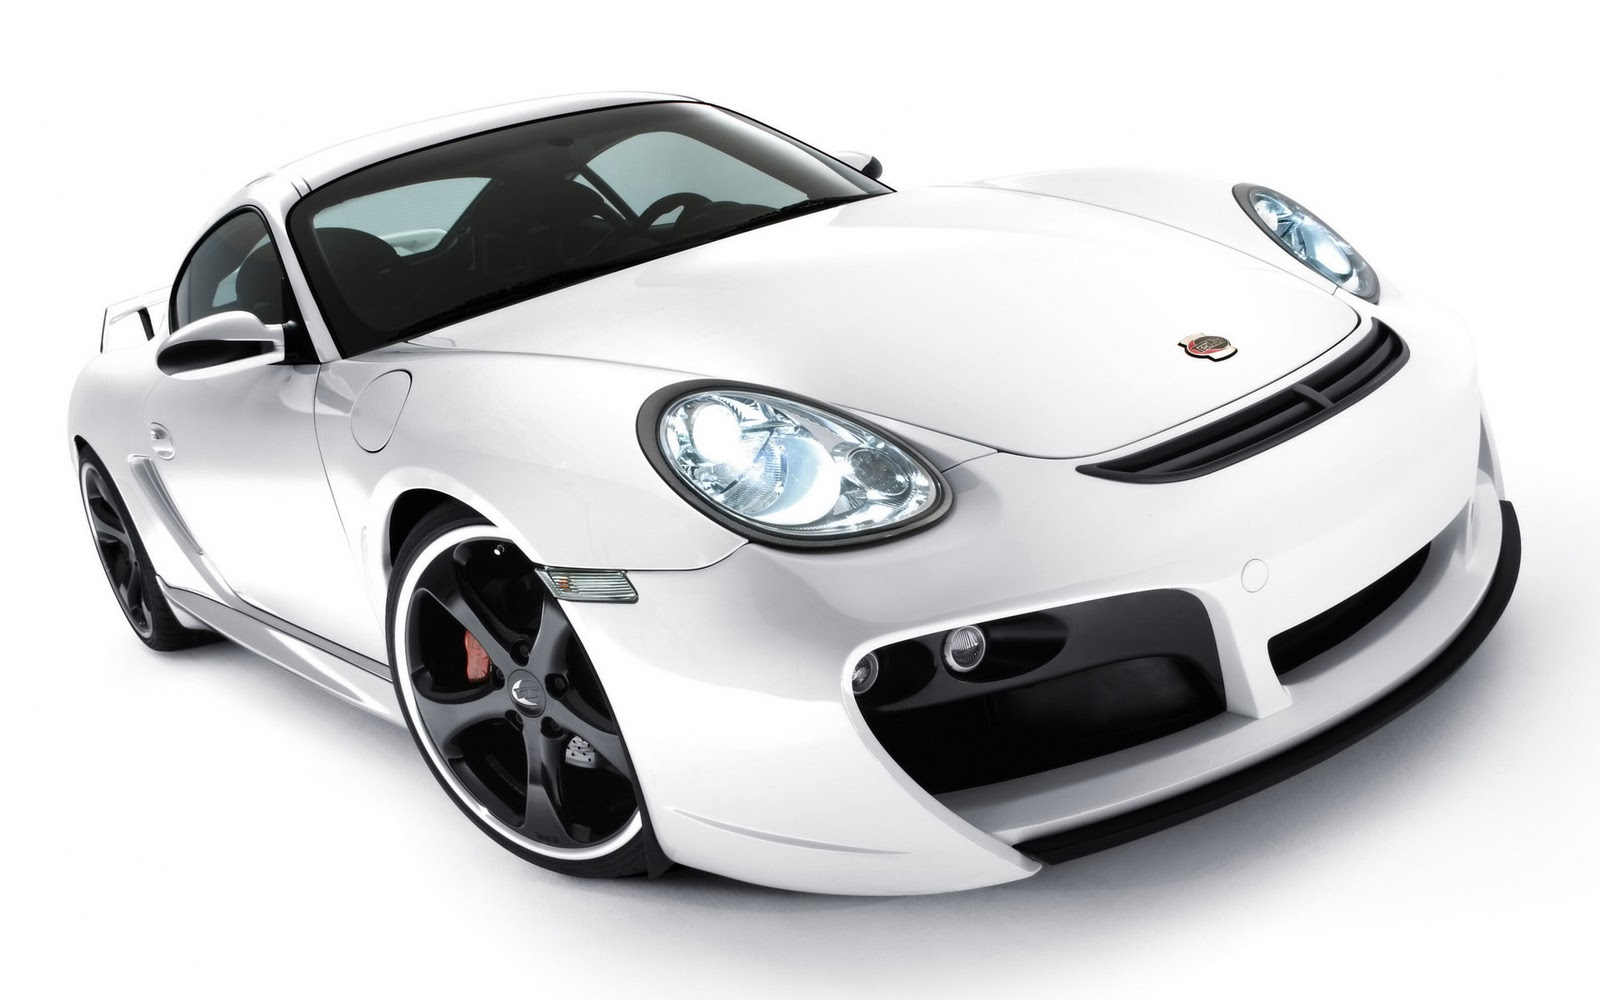 http://2.bp.blogspot.com/-0MPfxVxUG94/TwtfqWsRy4I/AAAAAAAABPo/LhXF2JwJw2U/s1600/Car+Wallpaper+6.jpg